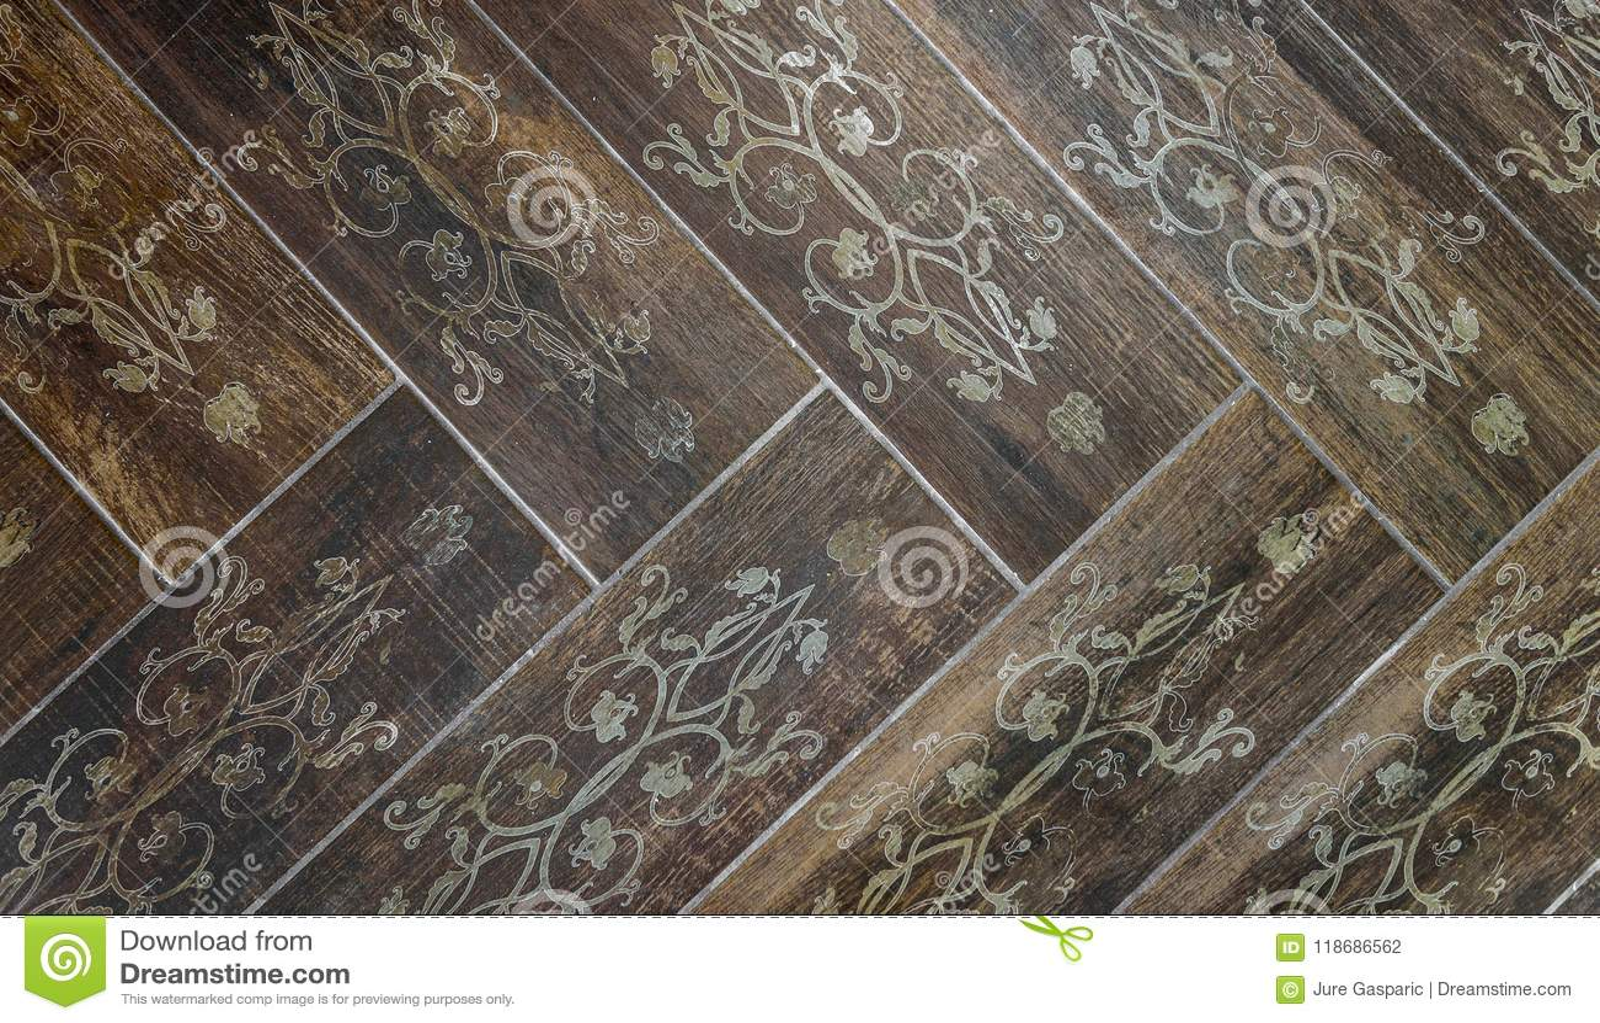 Vintage esagonale italiano piastrelle per pavimento foto